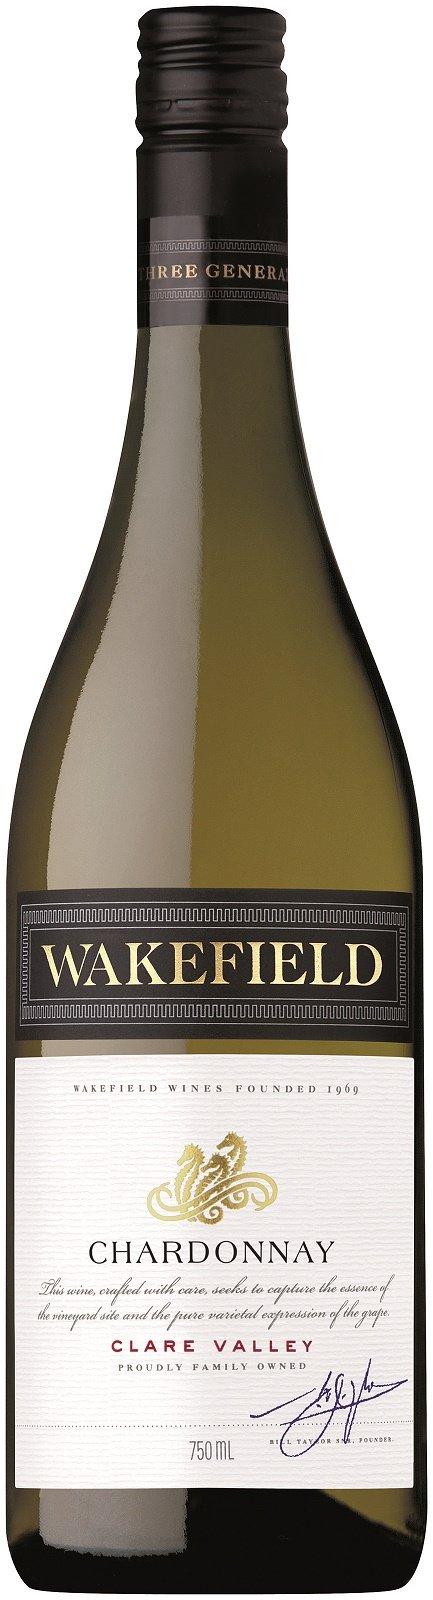 6x-075l-2016er-Wakefield-Estate-Chardonnay-South-Australia-Australien-Weiwein-trocken